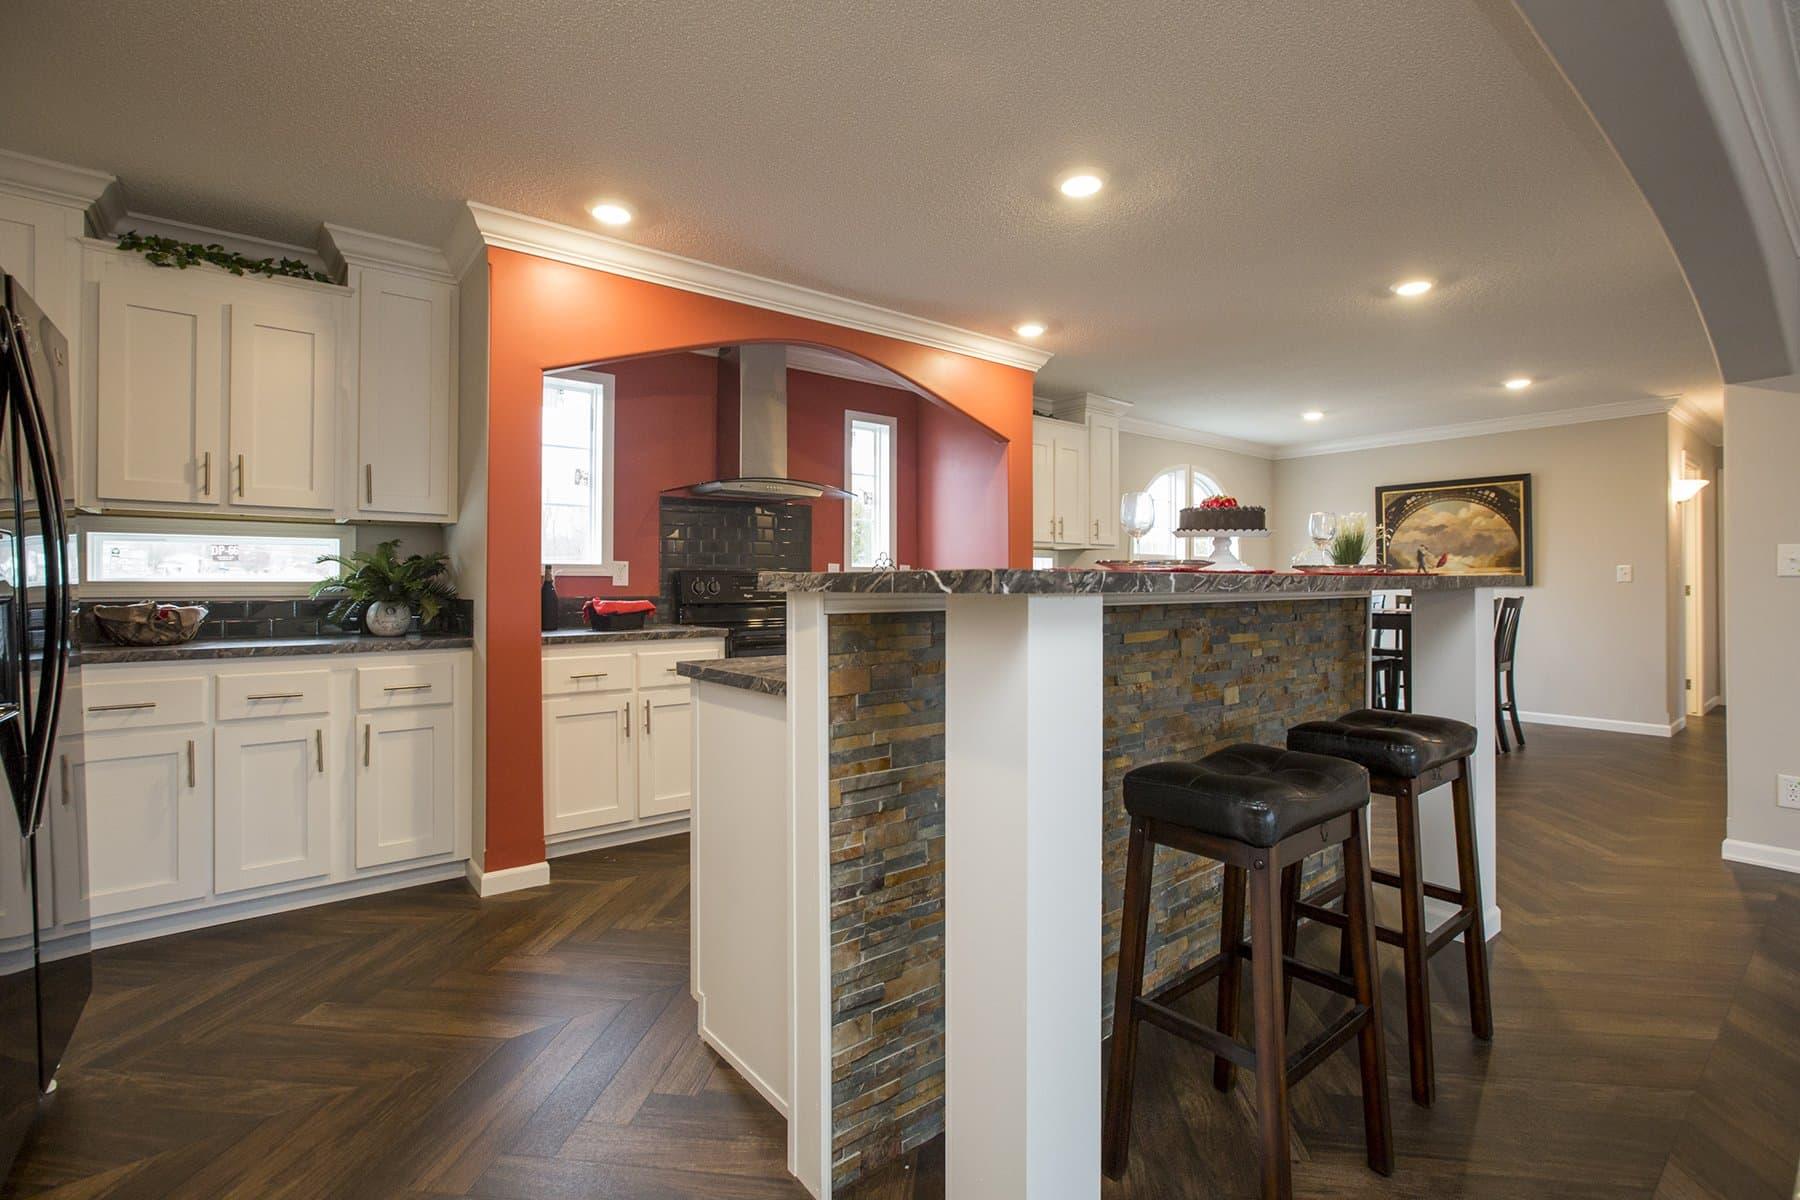 Biltmore 2864 03 kitchen 2 copy